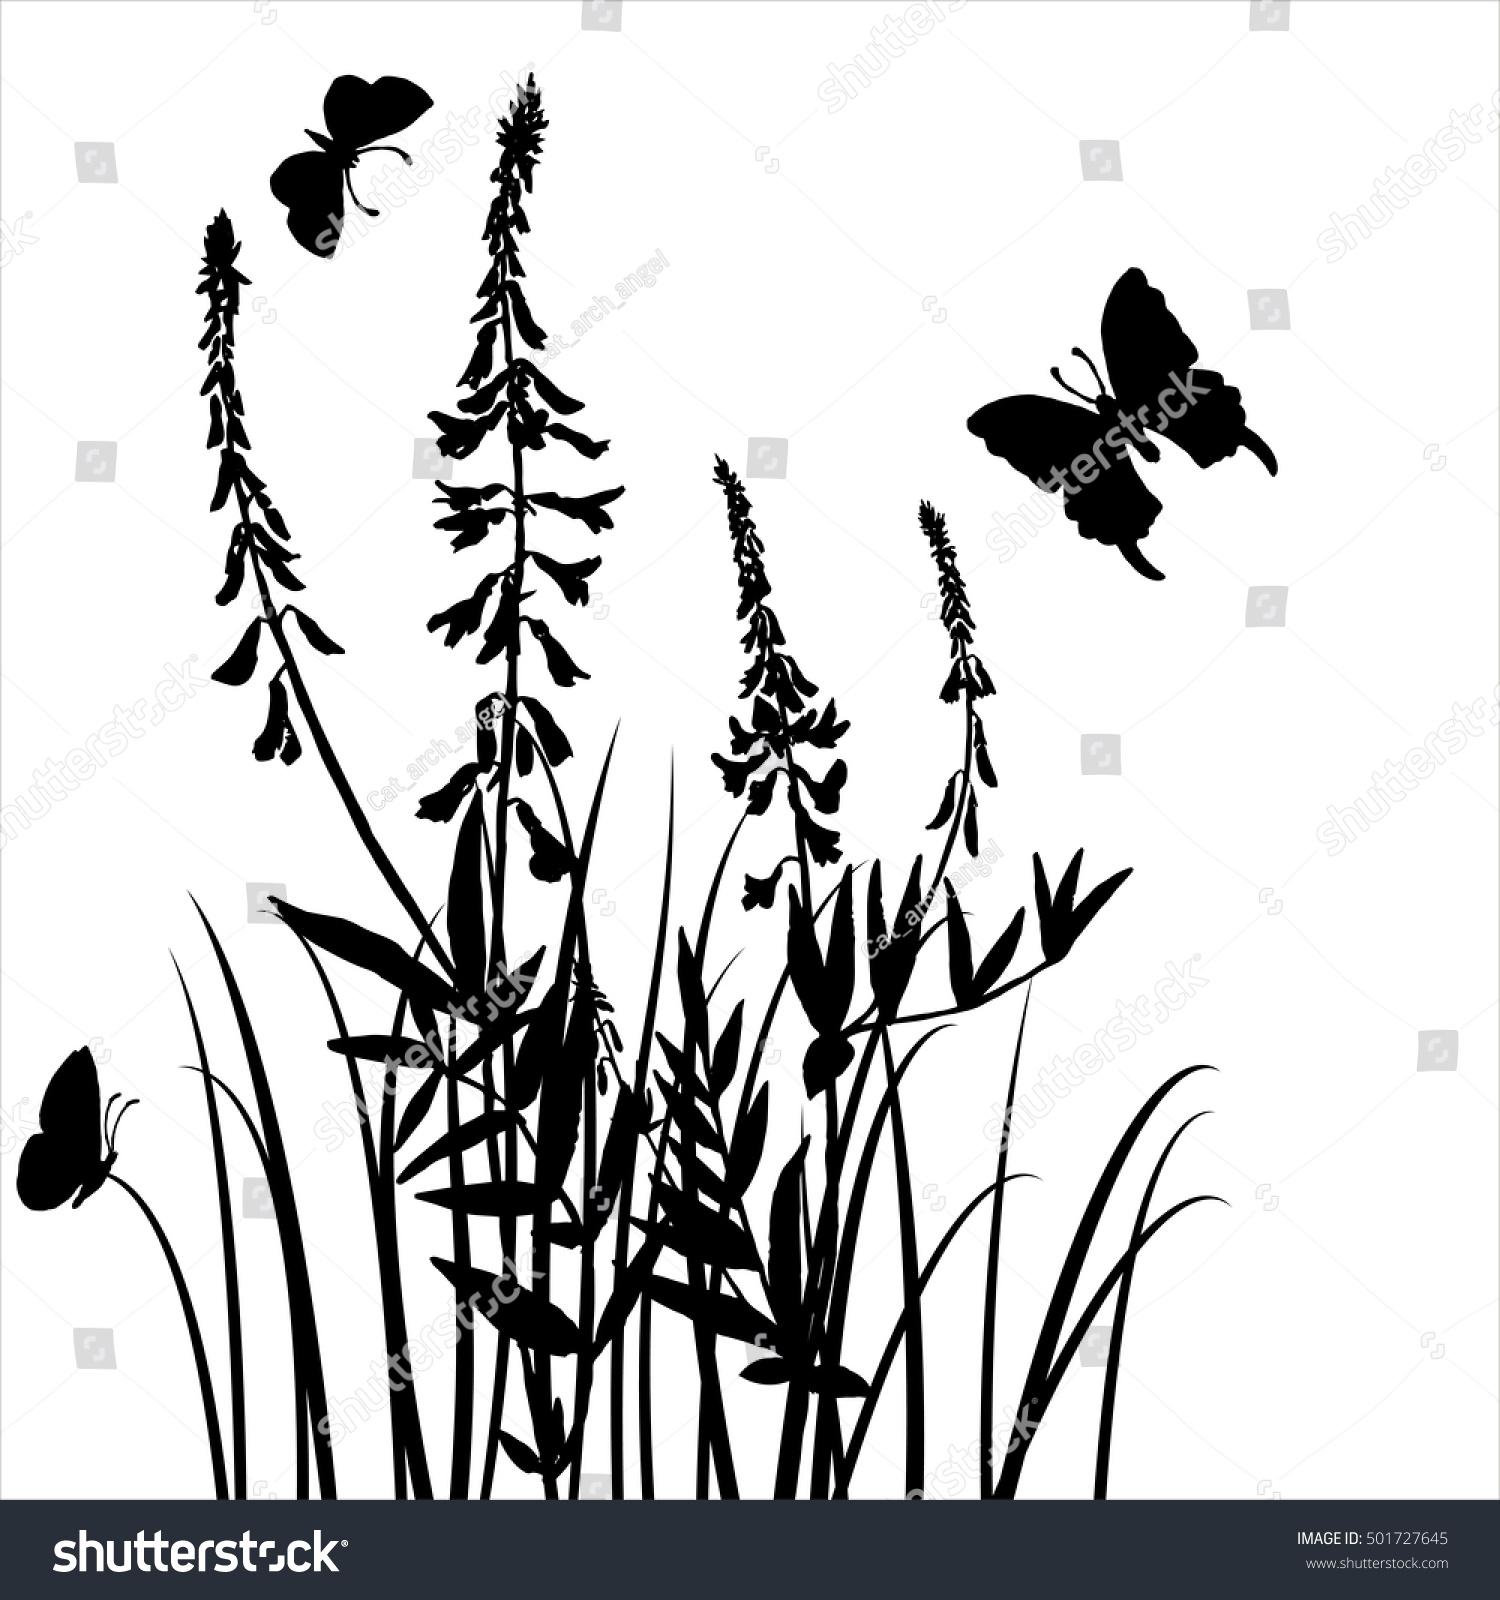 Vector Silhouettes Flowers Grass Butterflies Background Stock Vector ...